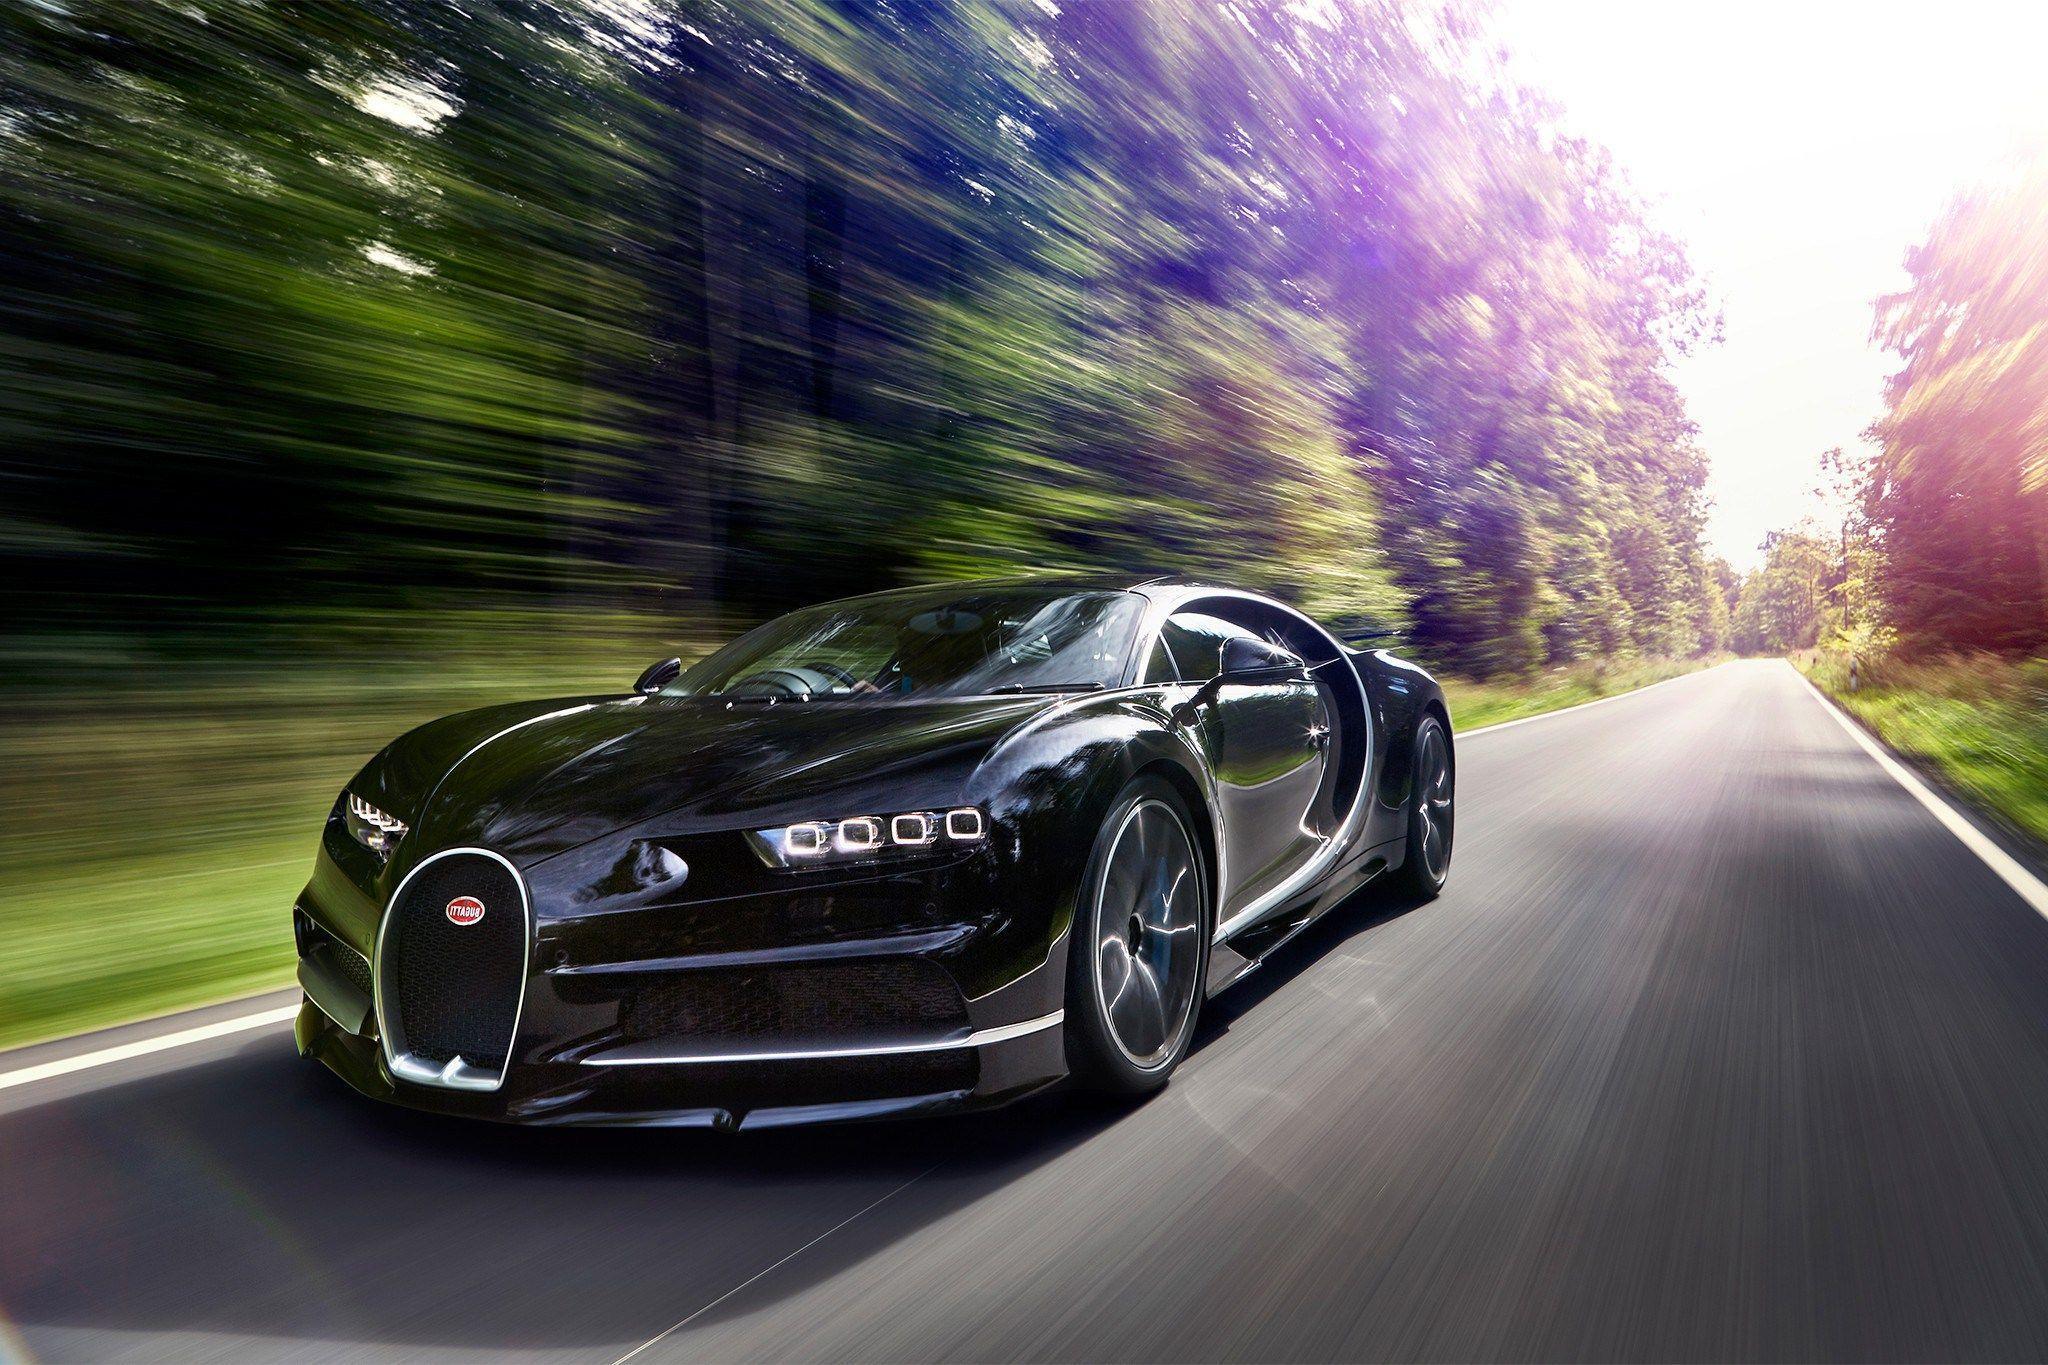 Bugatti Chiron 2017 Wallpapers - Wallpaper Cave